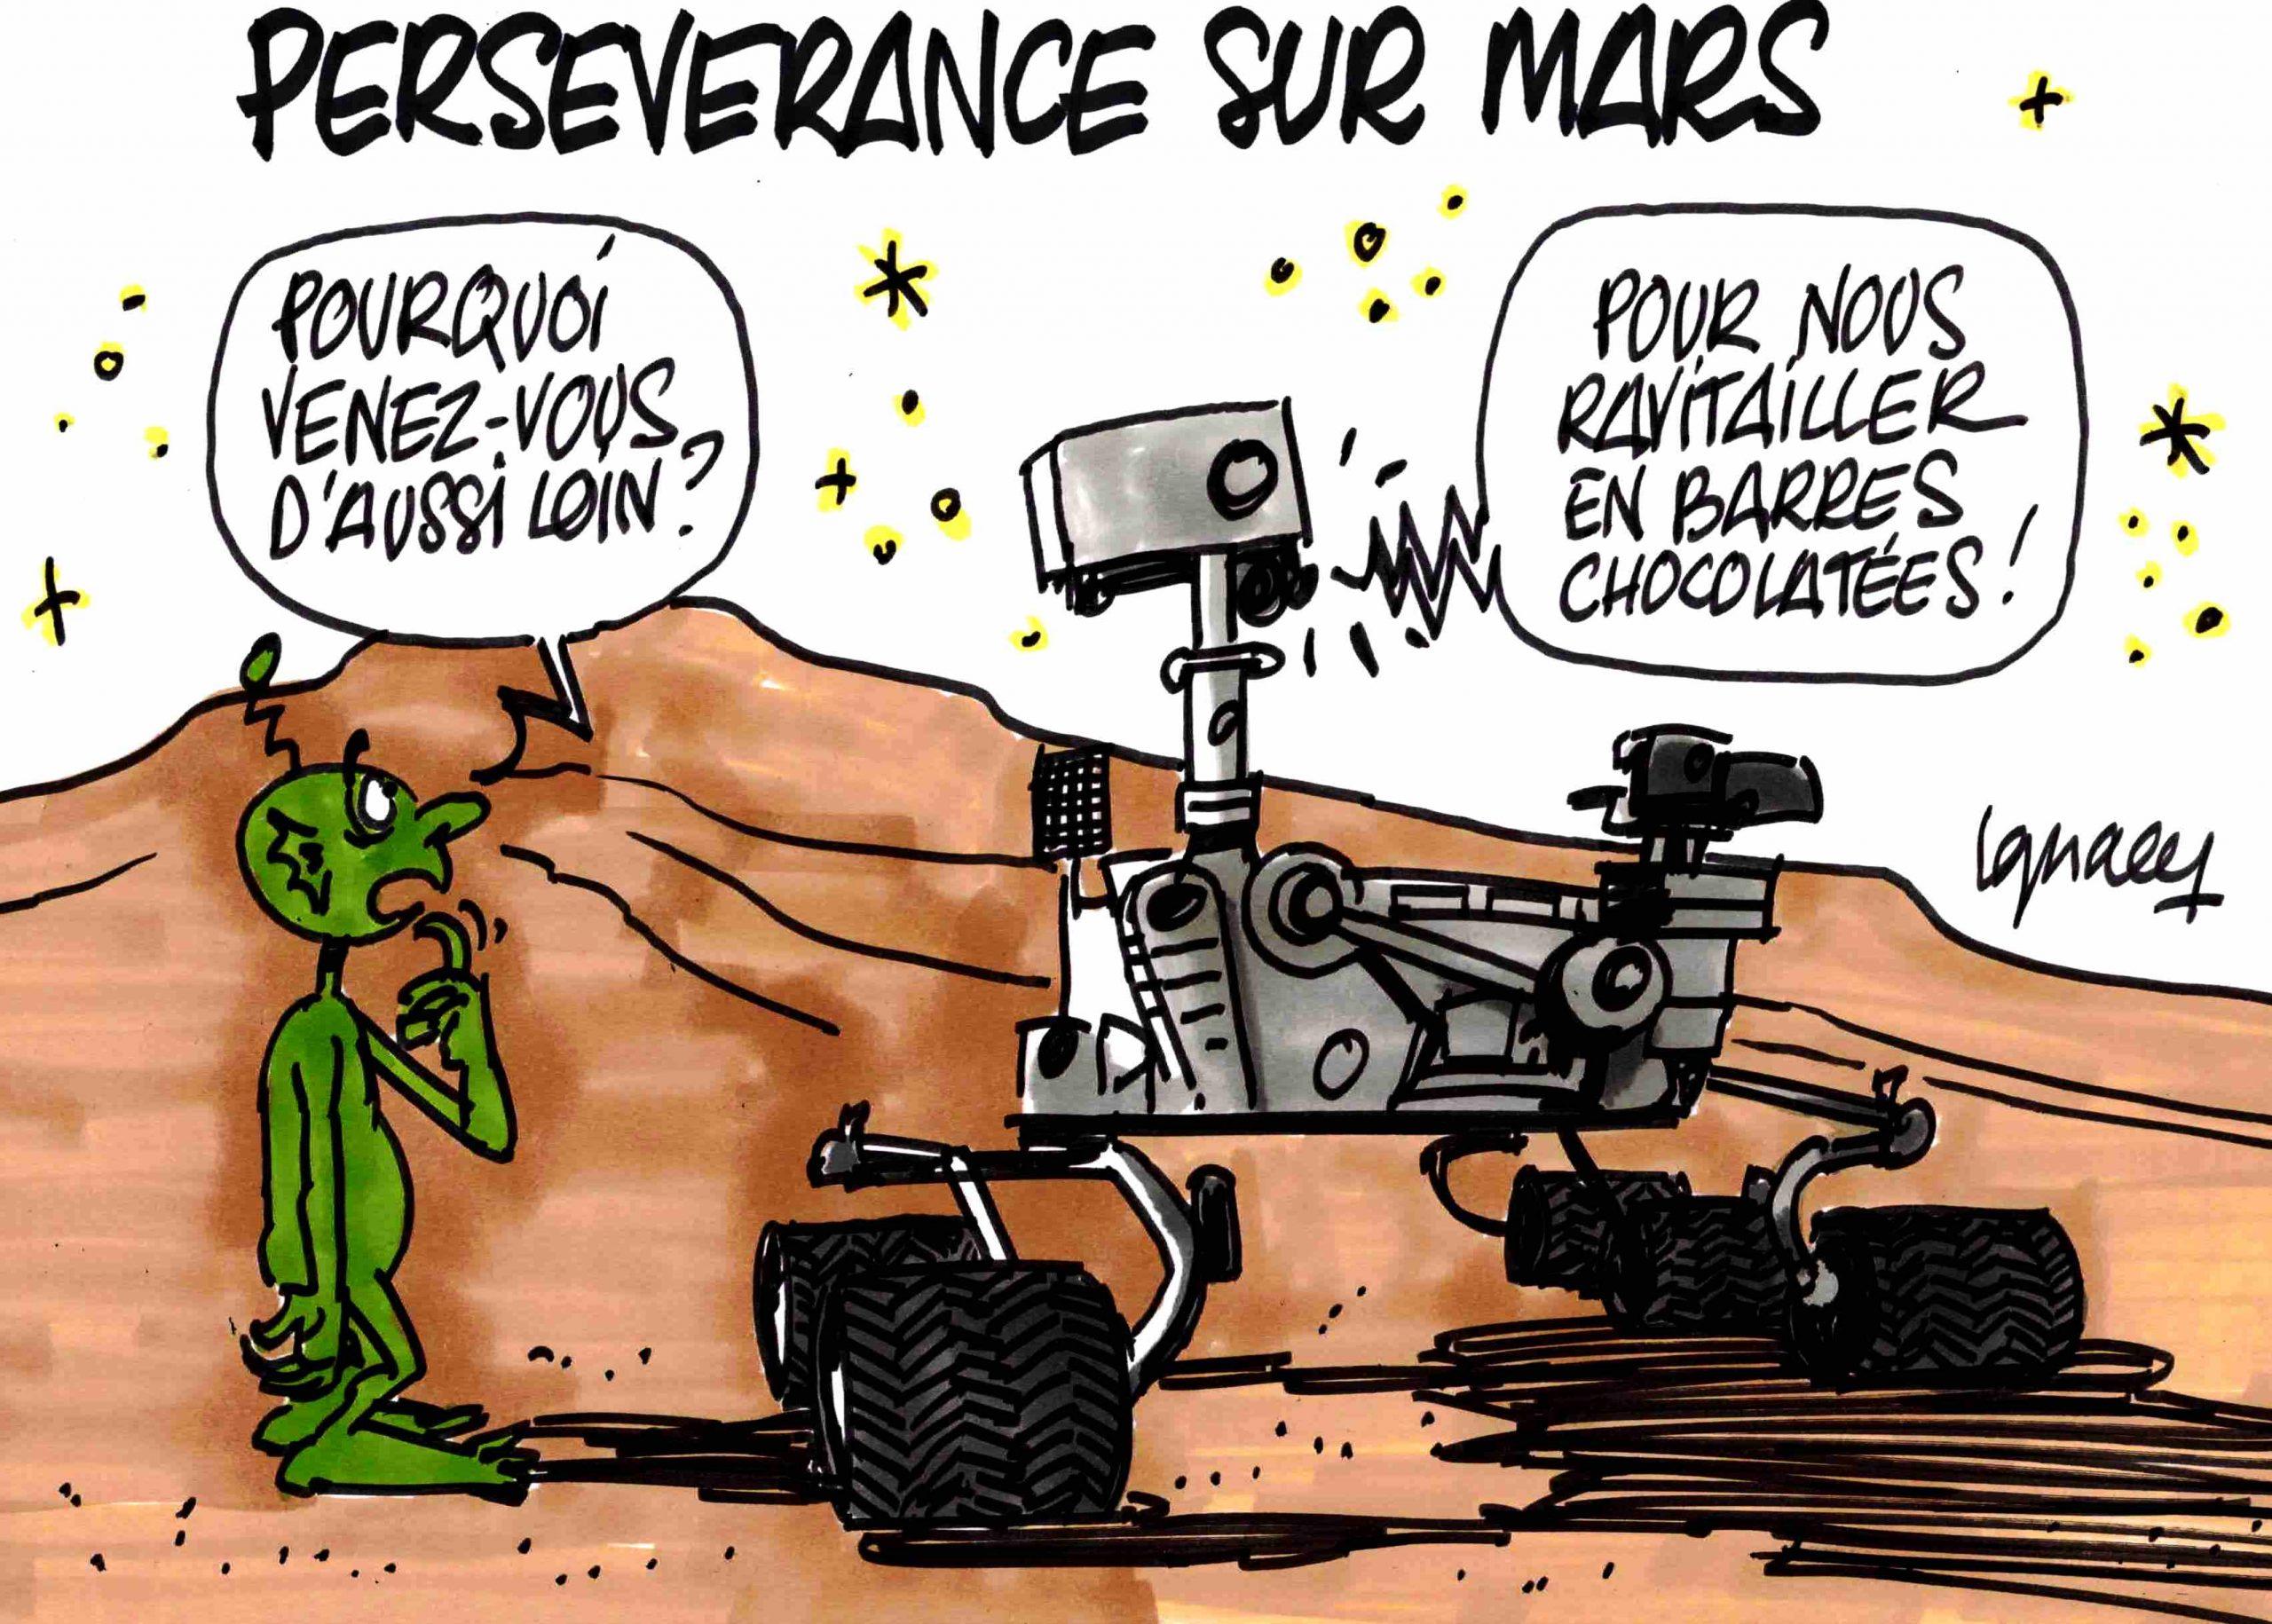 Ignace - Perseverance sur Mars